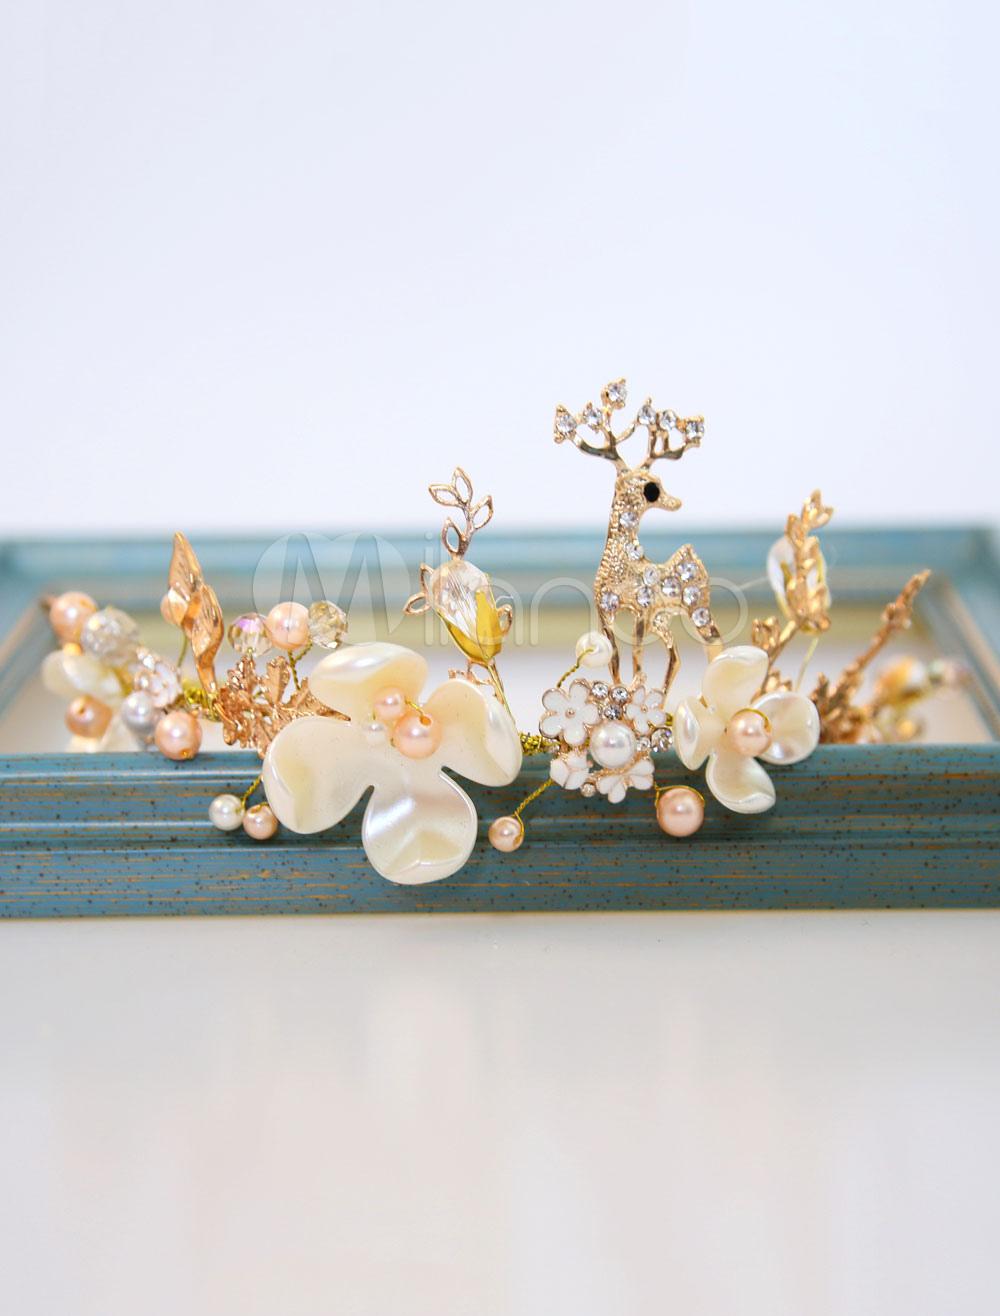 Buy Pearls Wedding Headpieces Flowers Deer Headband Bridal Hair Accessories for $13.99 in Milanoo store